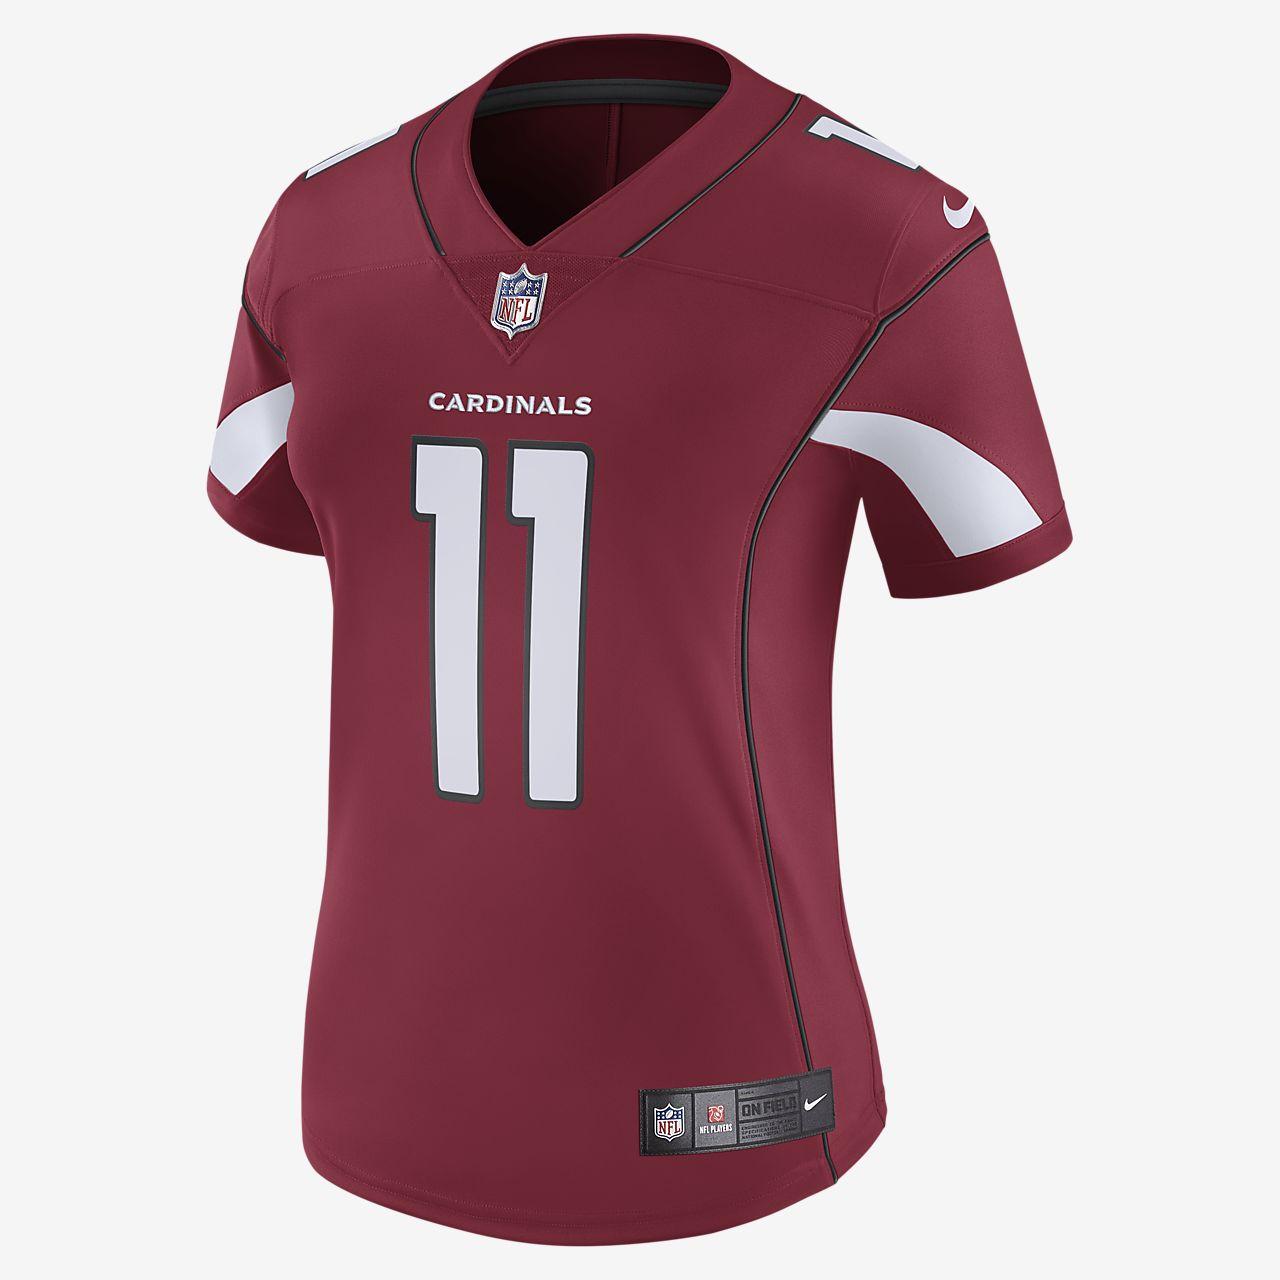 NFL Arizona Cardinals Limited Jersey (Larry Fitzgerald) Women's Football Jersey